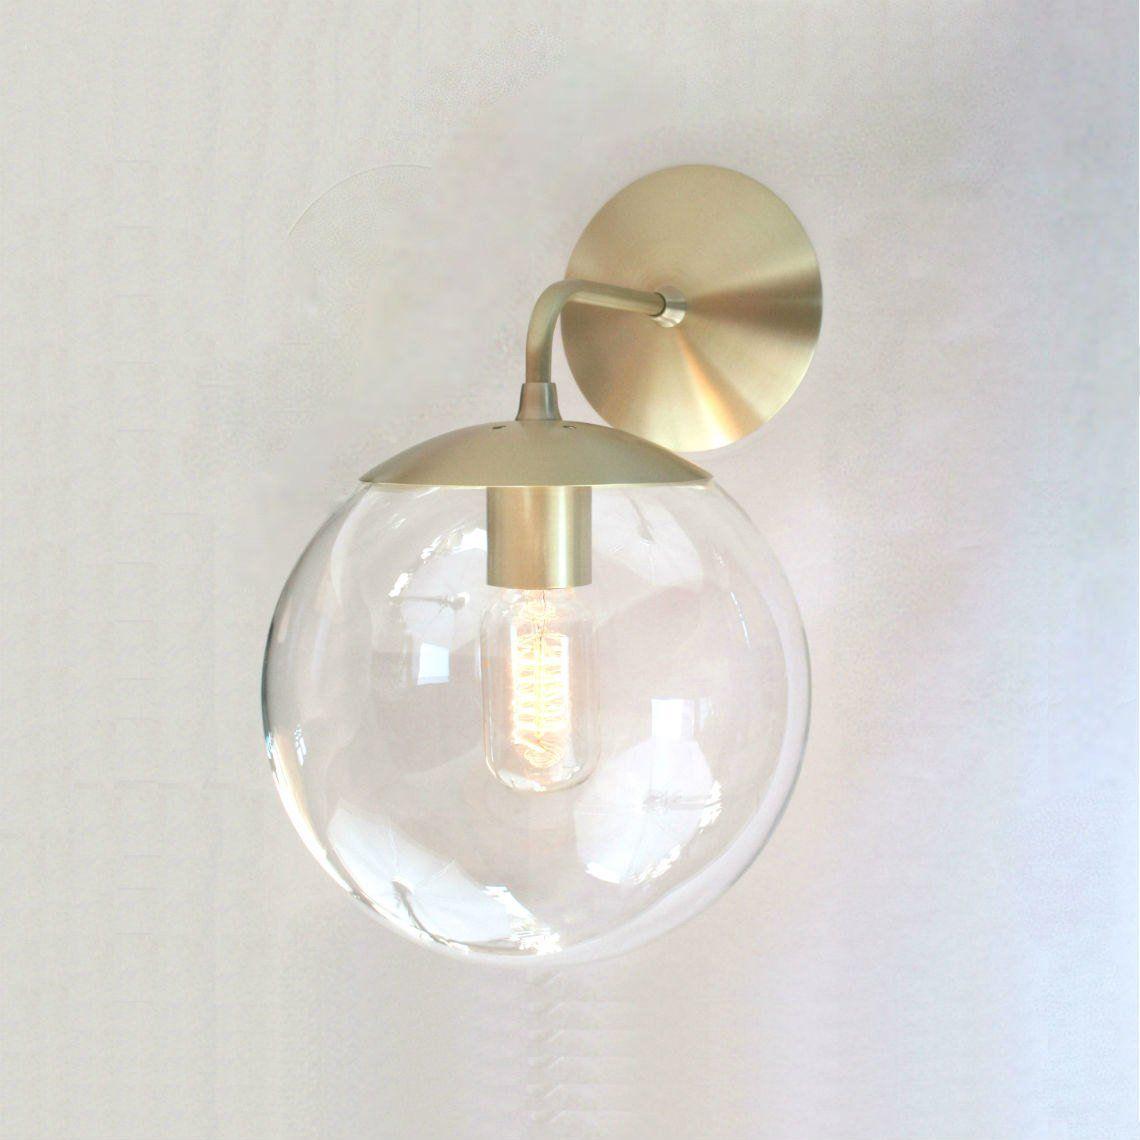 designer wall sconces lighting. Mid Century Modern Wall Sconce Light Clear Glass Globe - Orbiter 8 Mount Lighting By SanctumLighting Designer Sconces F